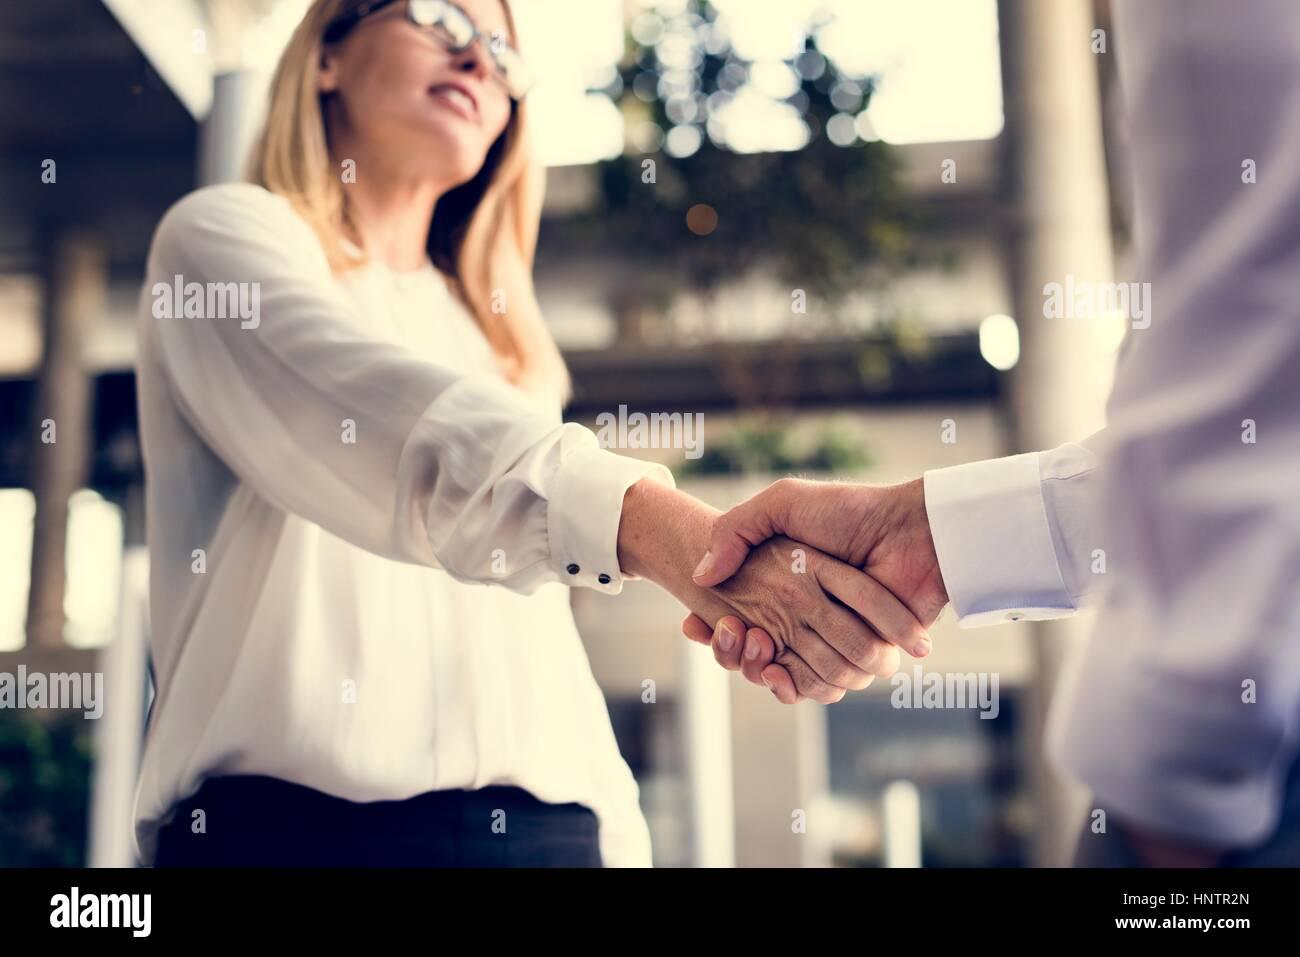 Männer Frauen Business Agreement Hände schütteln Stockbild